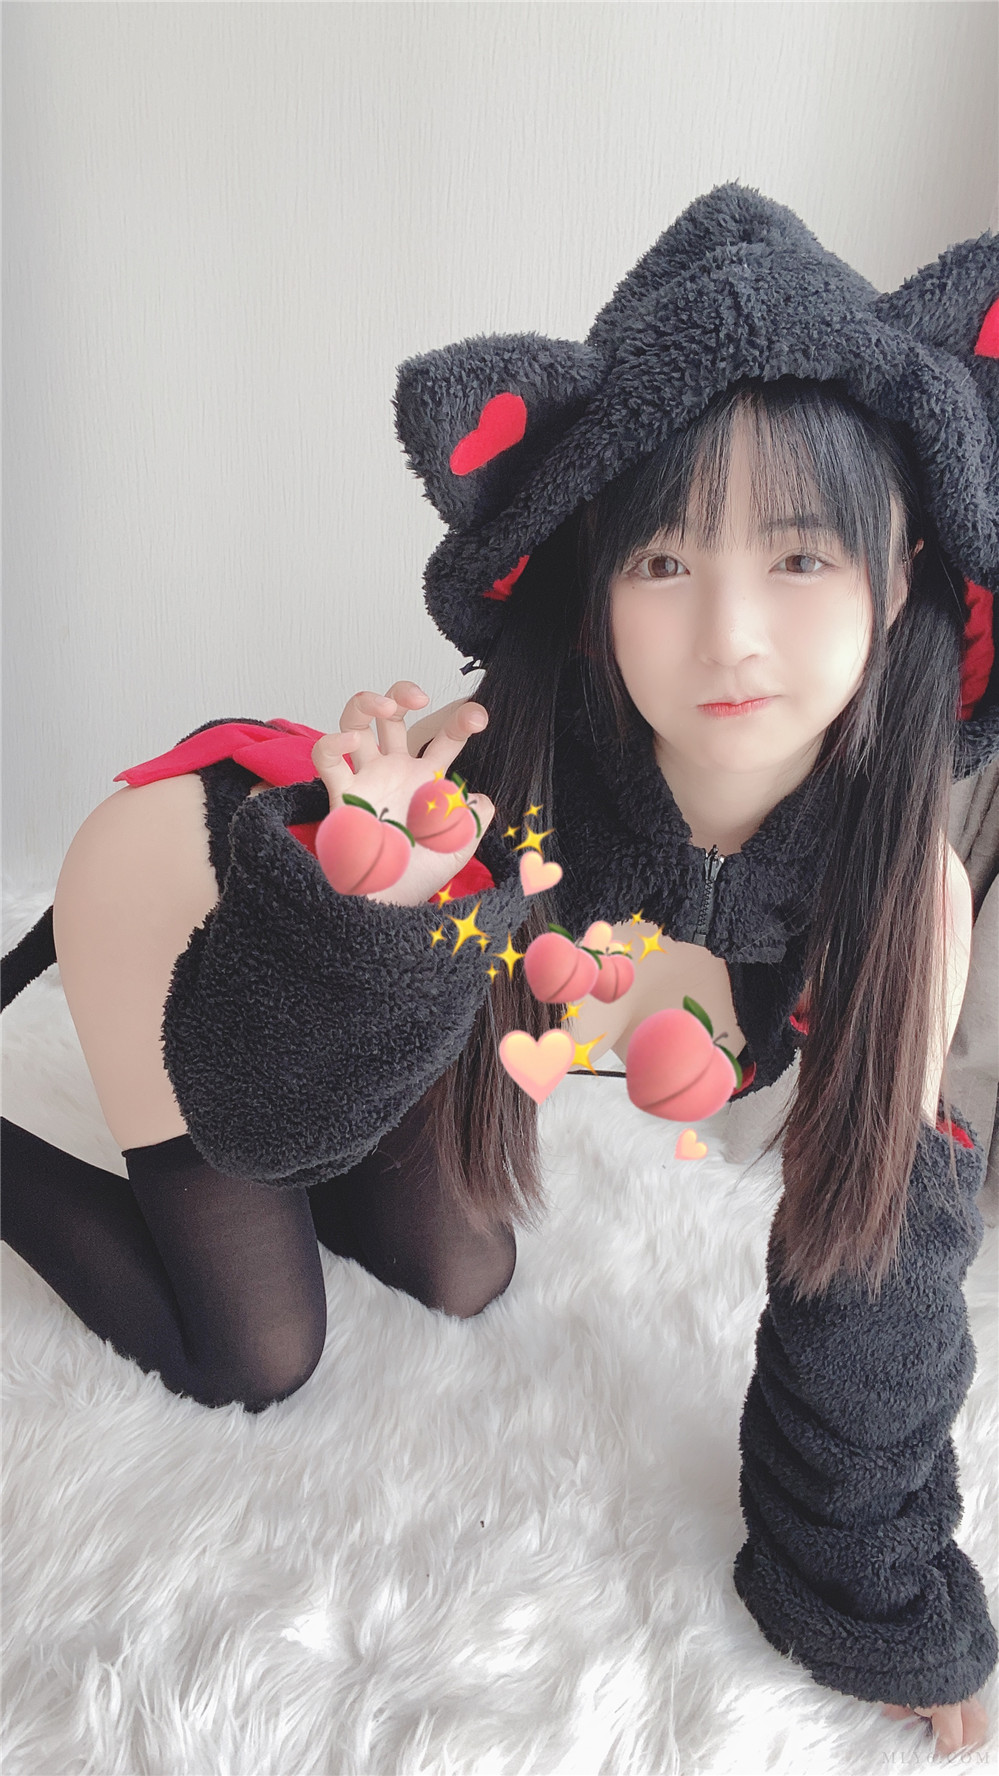 桜井宁宁 NO.014 小黑猫[50P4V-103MB]